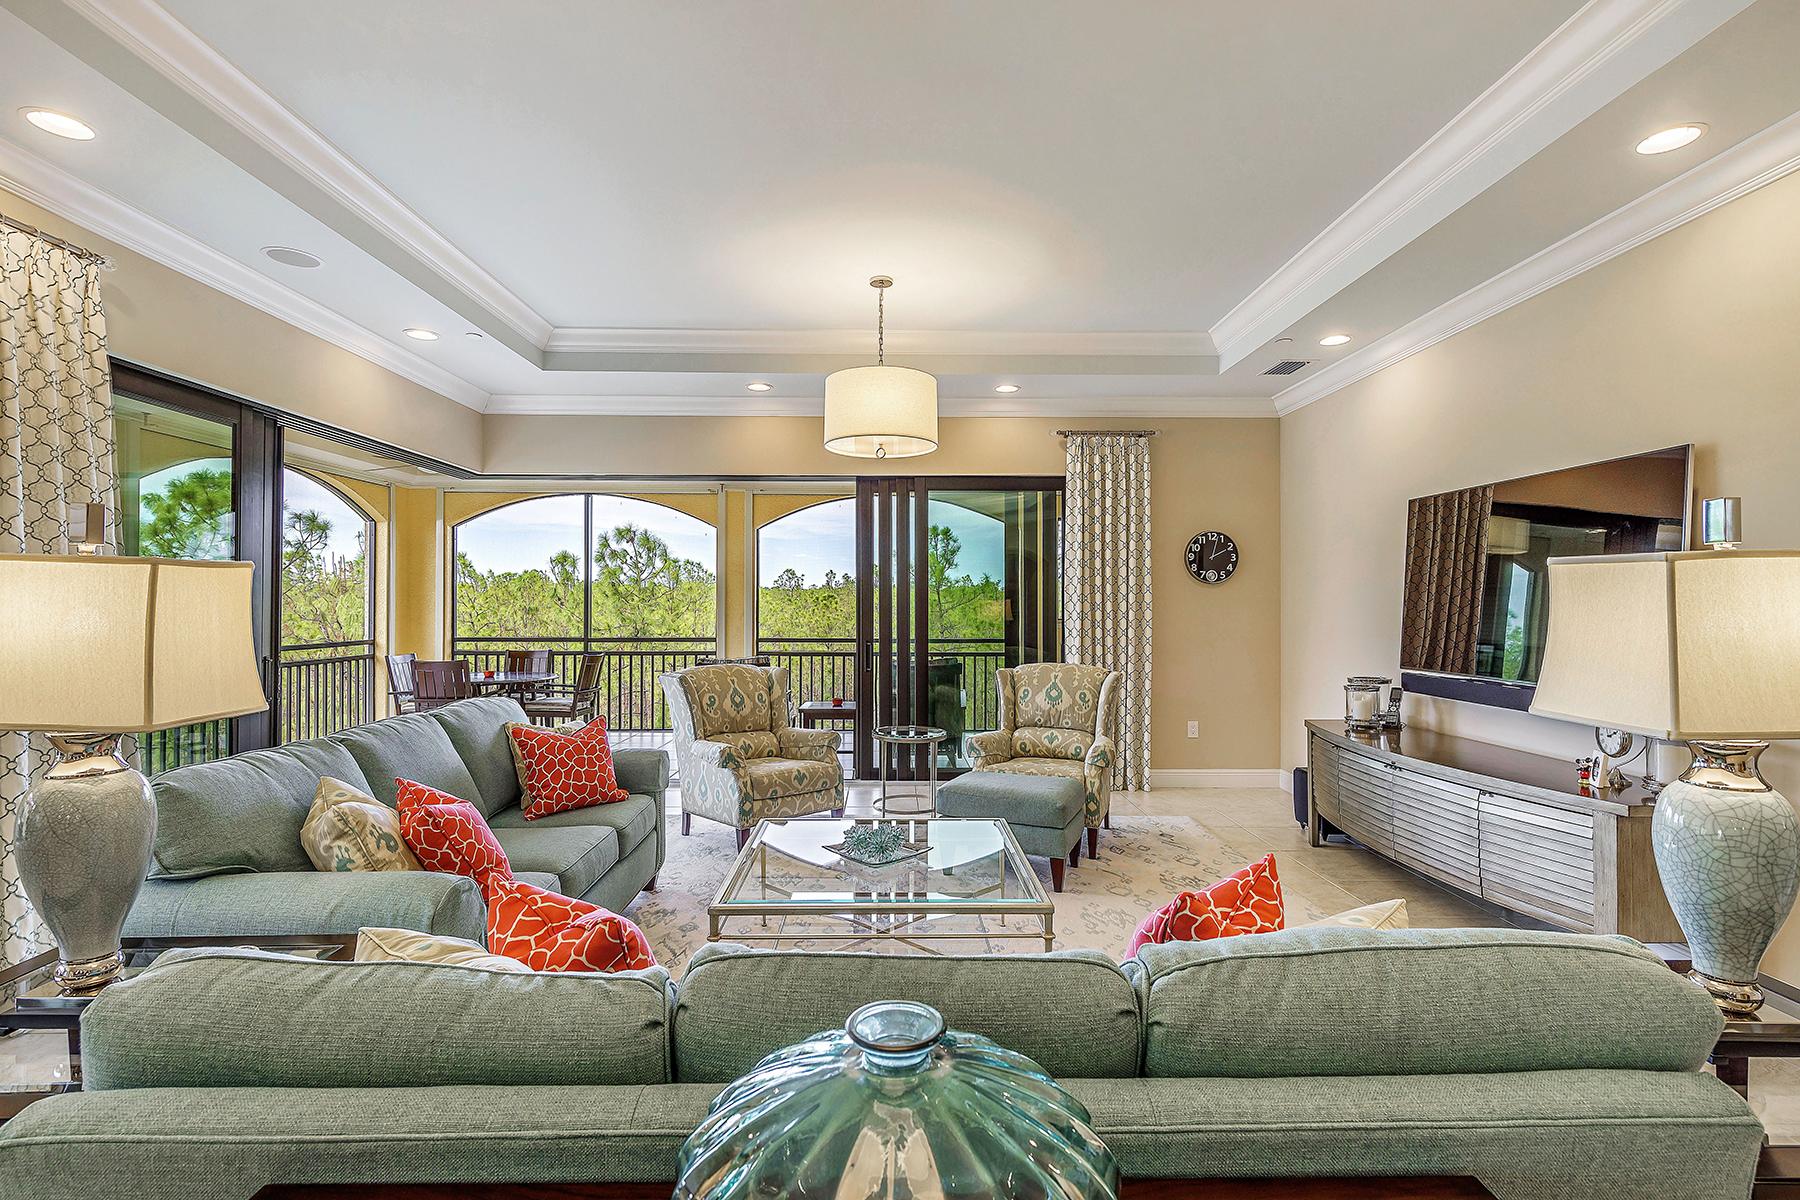 Condominium for Sale at TIBURON - ESPERANZA 2751 Tiburon Blvd E 301, Naples, Florida 34109 United States